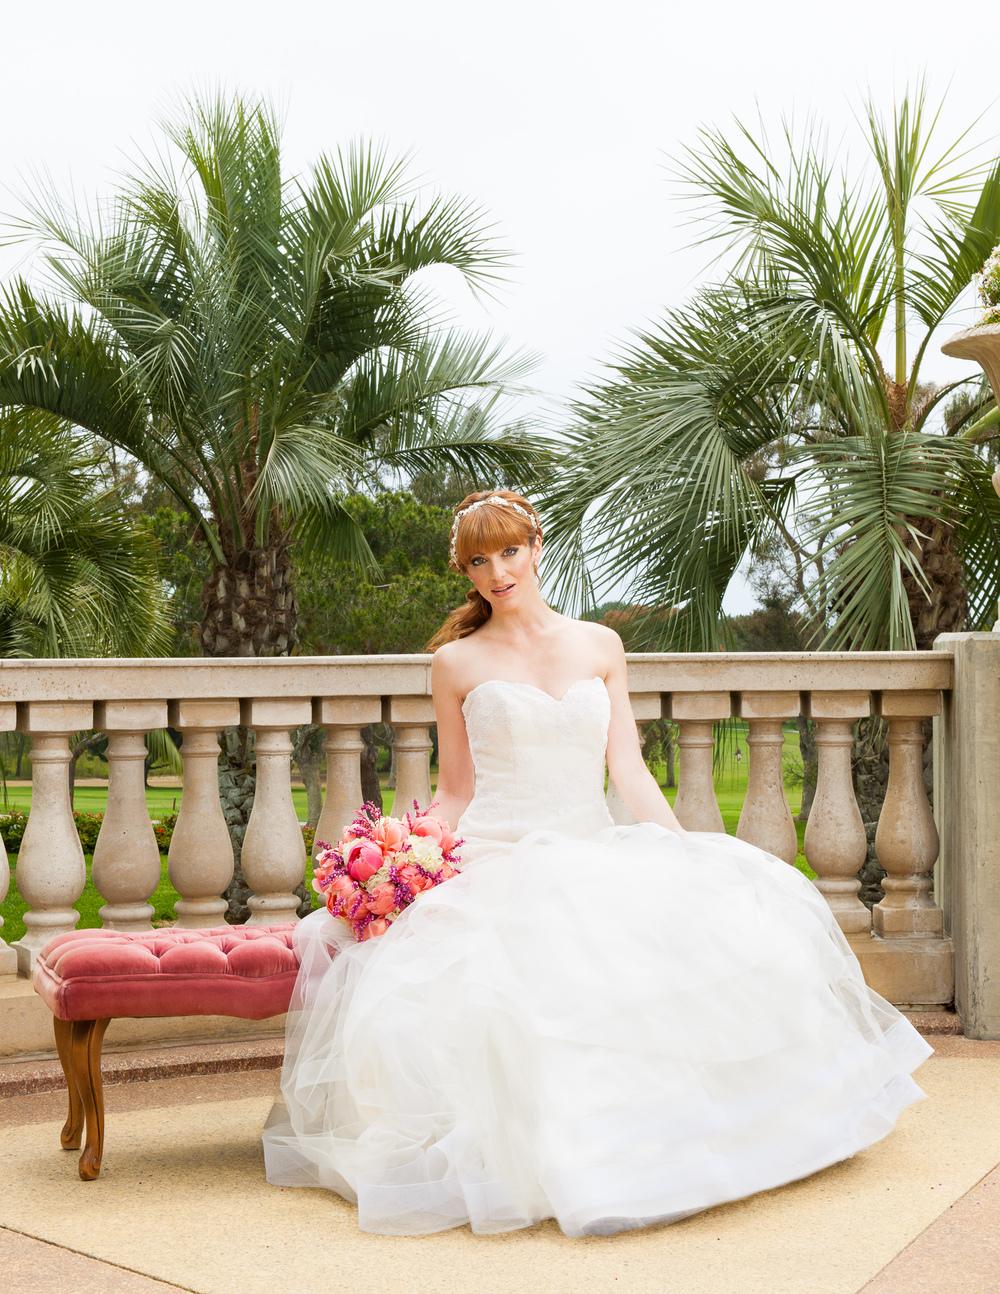 stewart_bertrand_wedding_photography_sdsw13-1009.jpg